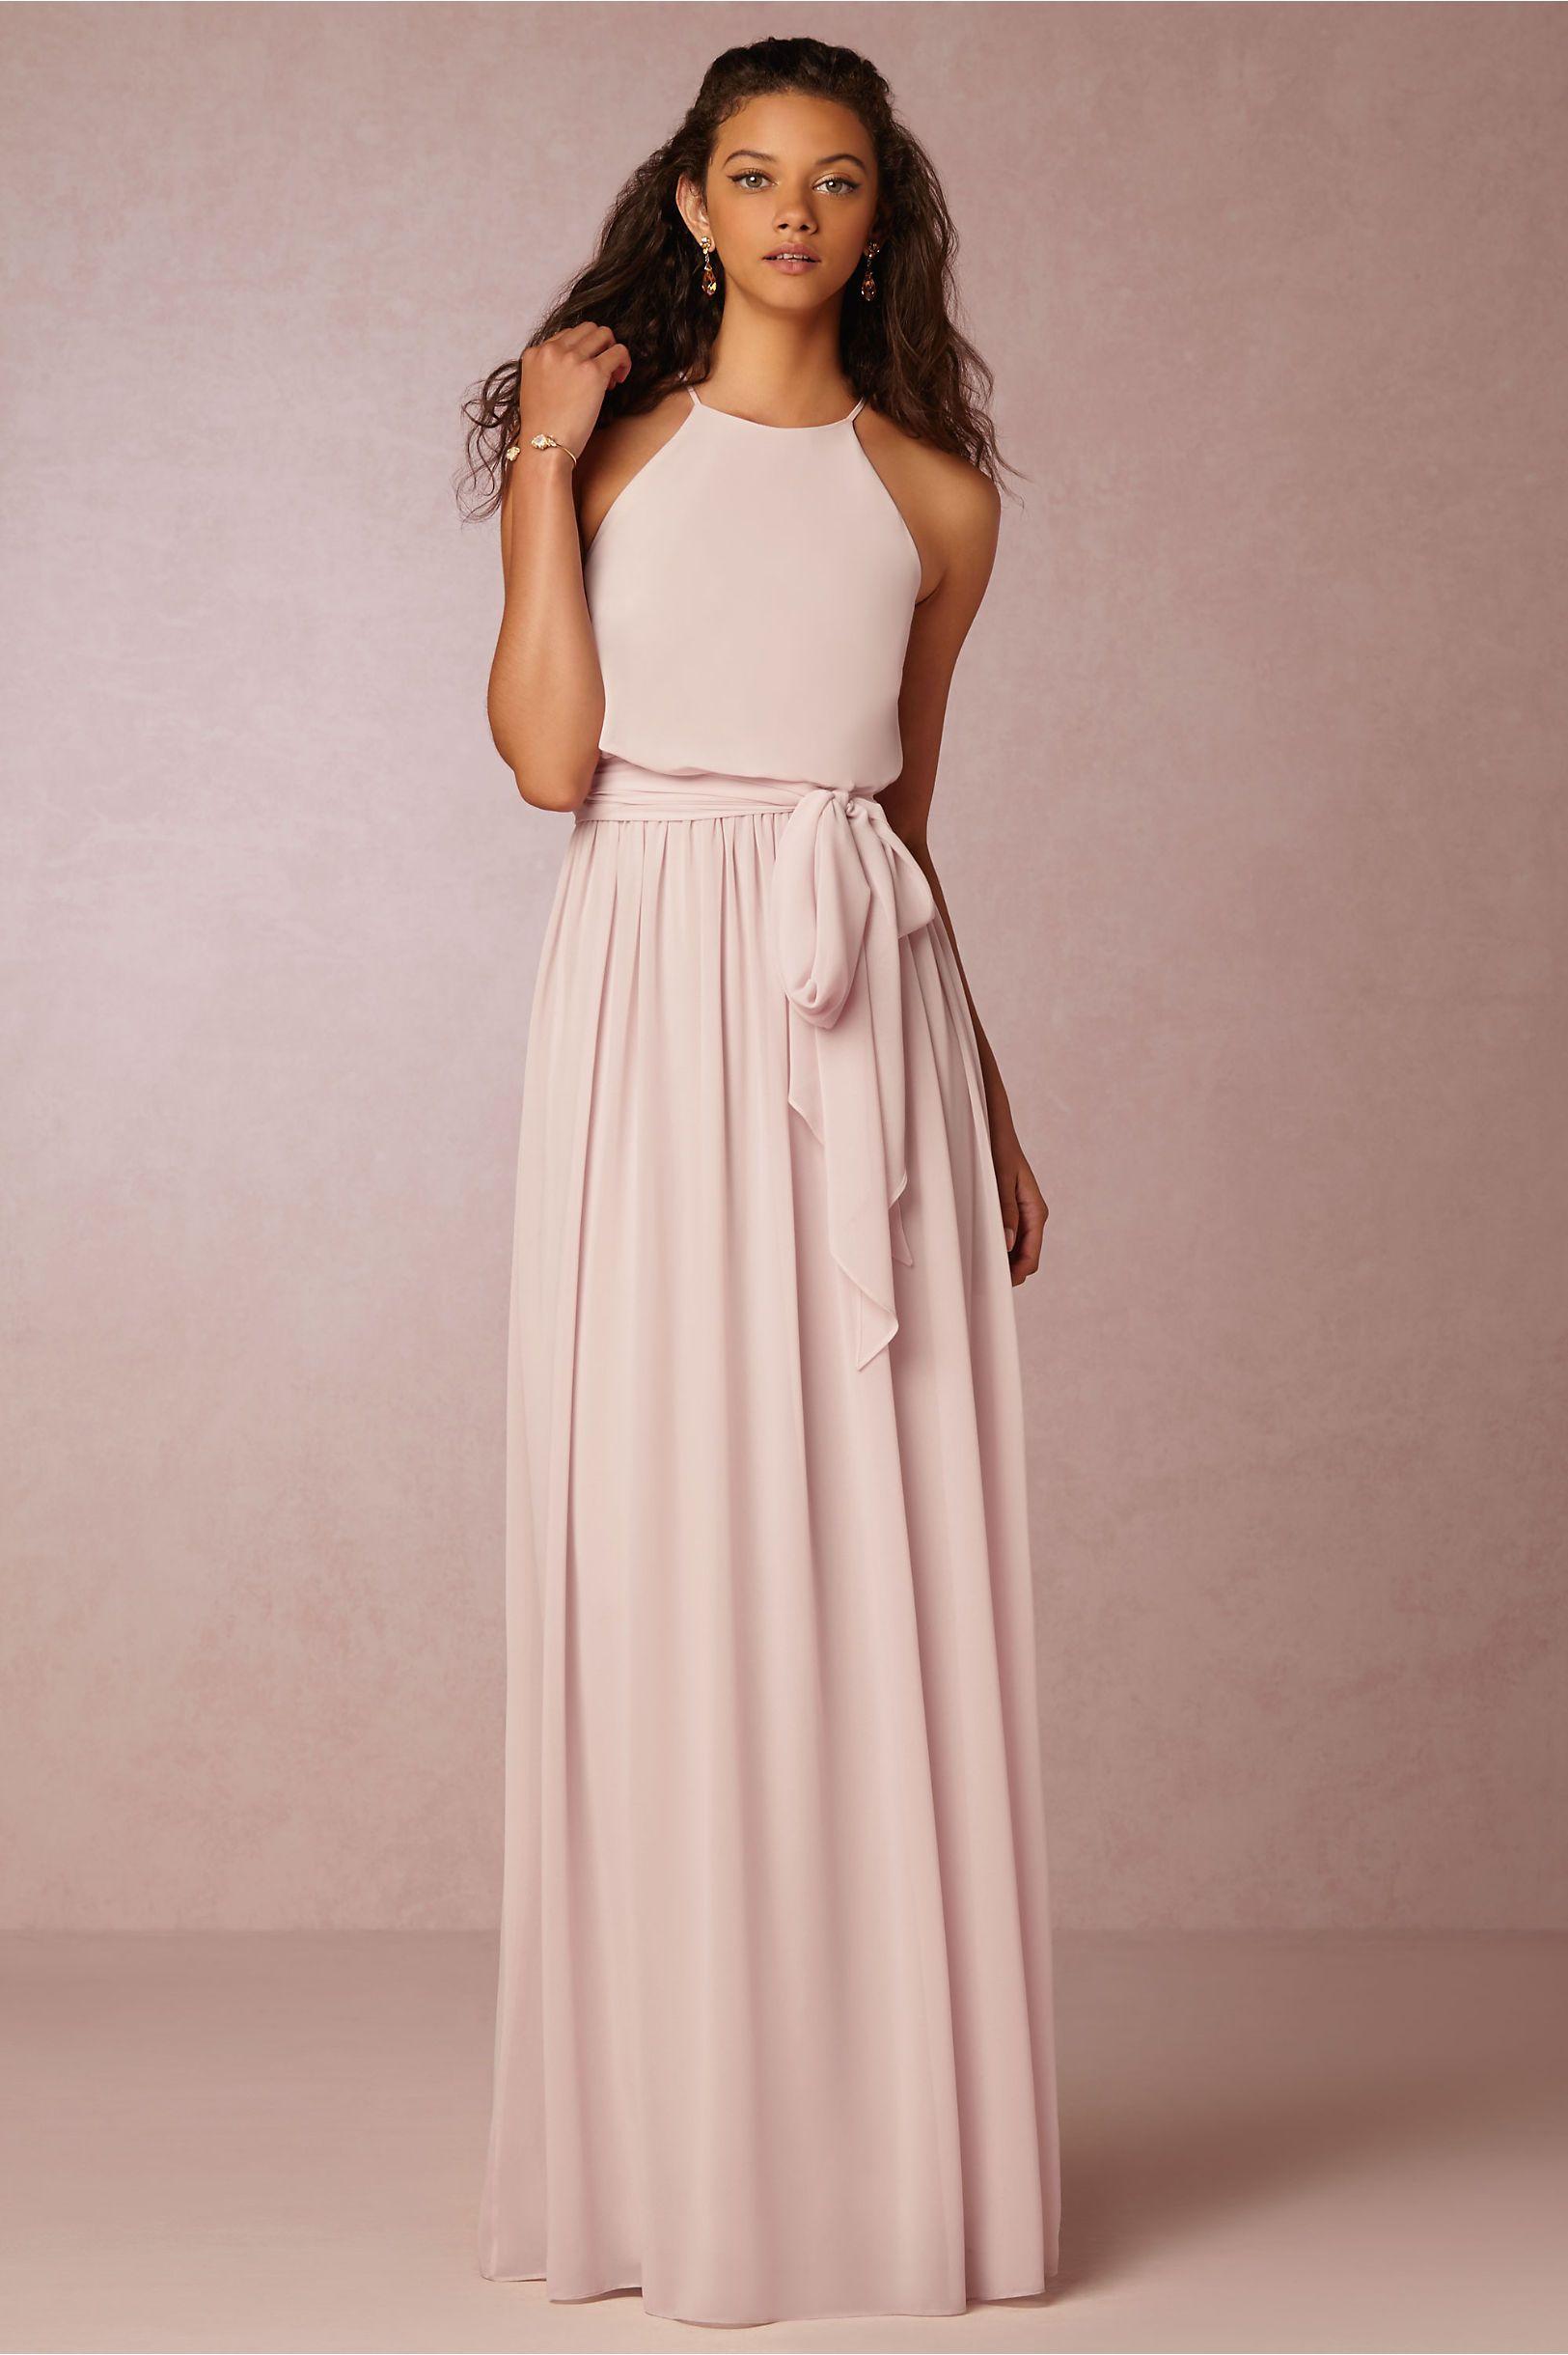 Bhldn alana dress in bridesmaids bridesmaid dresses at bhldn soon